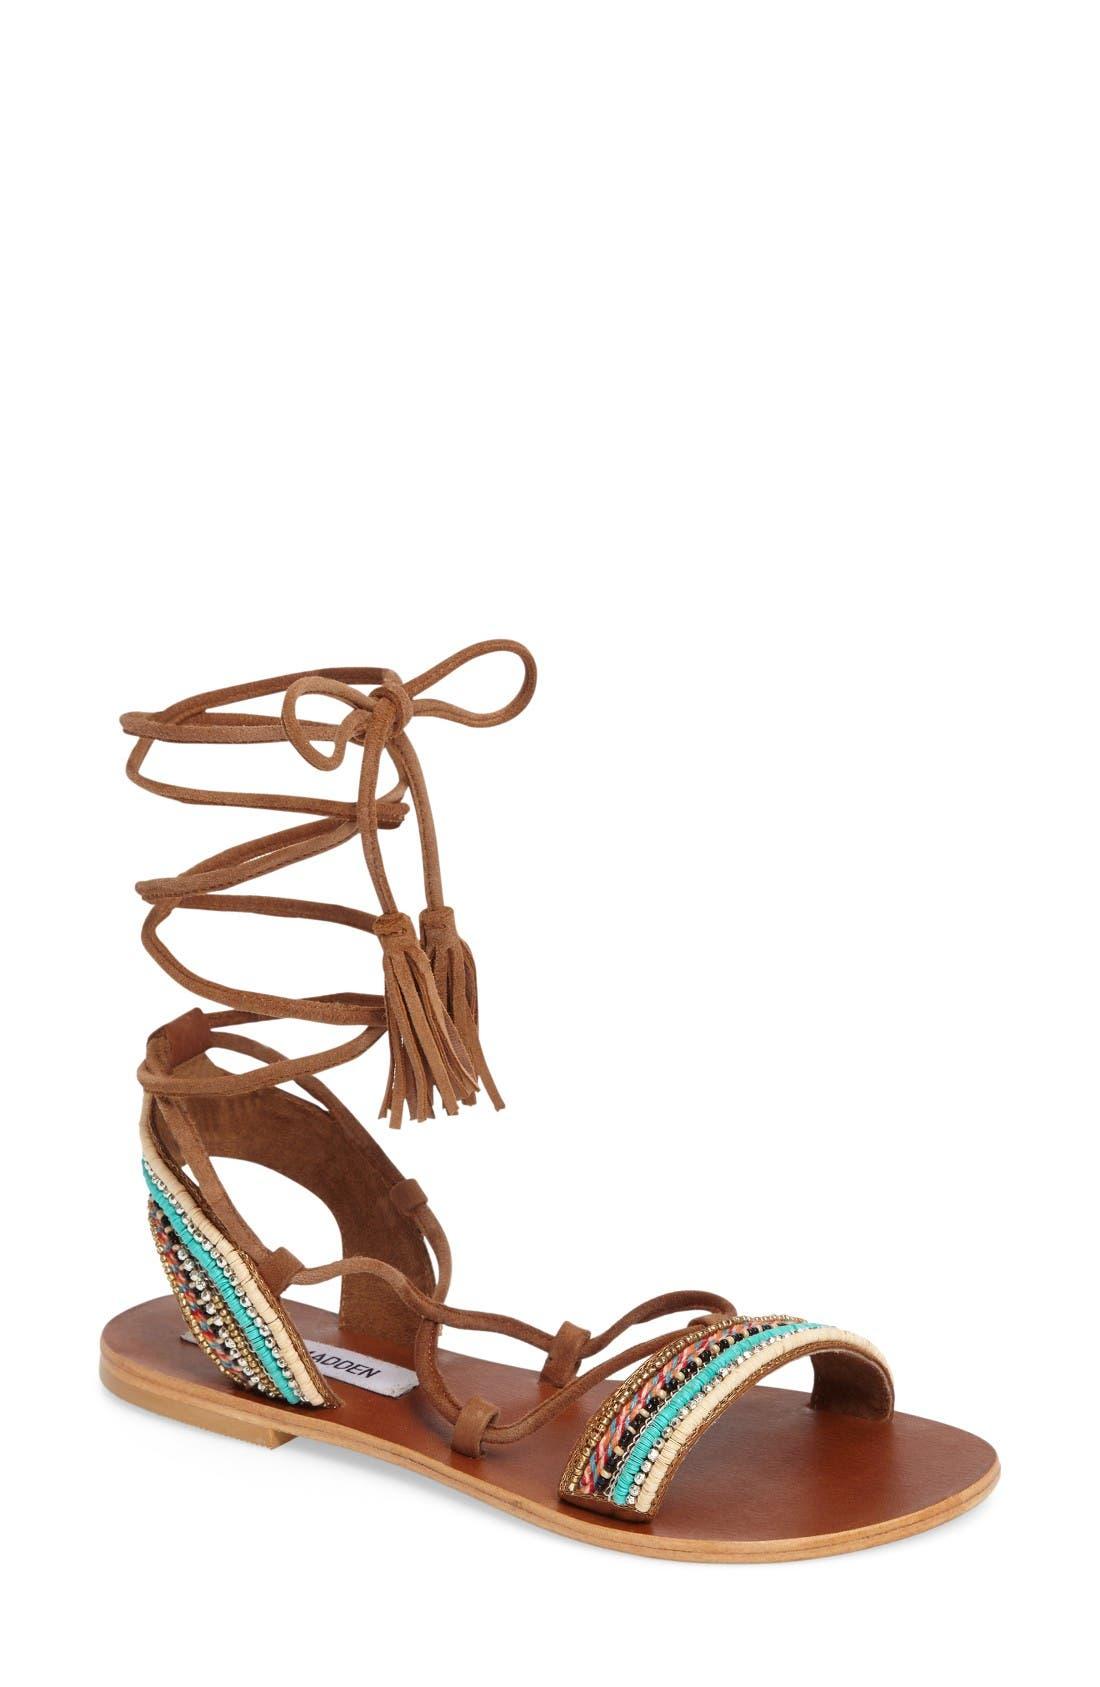 Orva Embellished Ghillie Wrap Sandal,                             Main thumbnail 1, color,                             Natural Multi